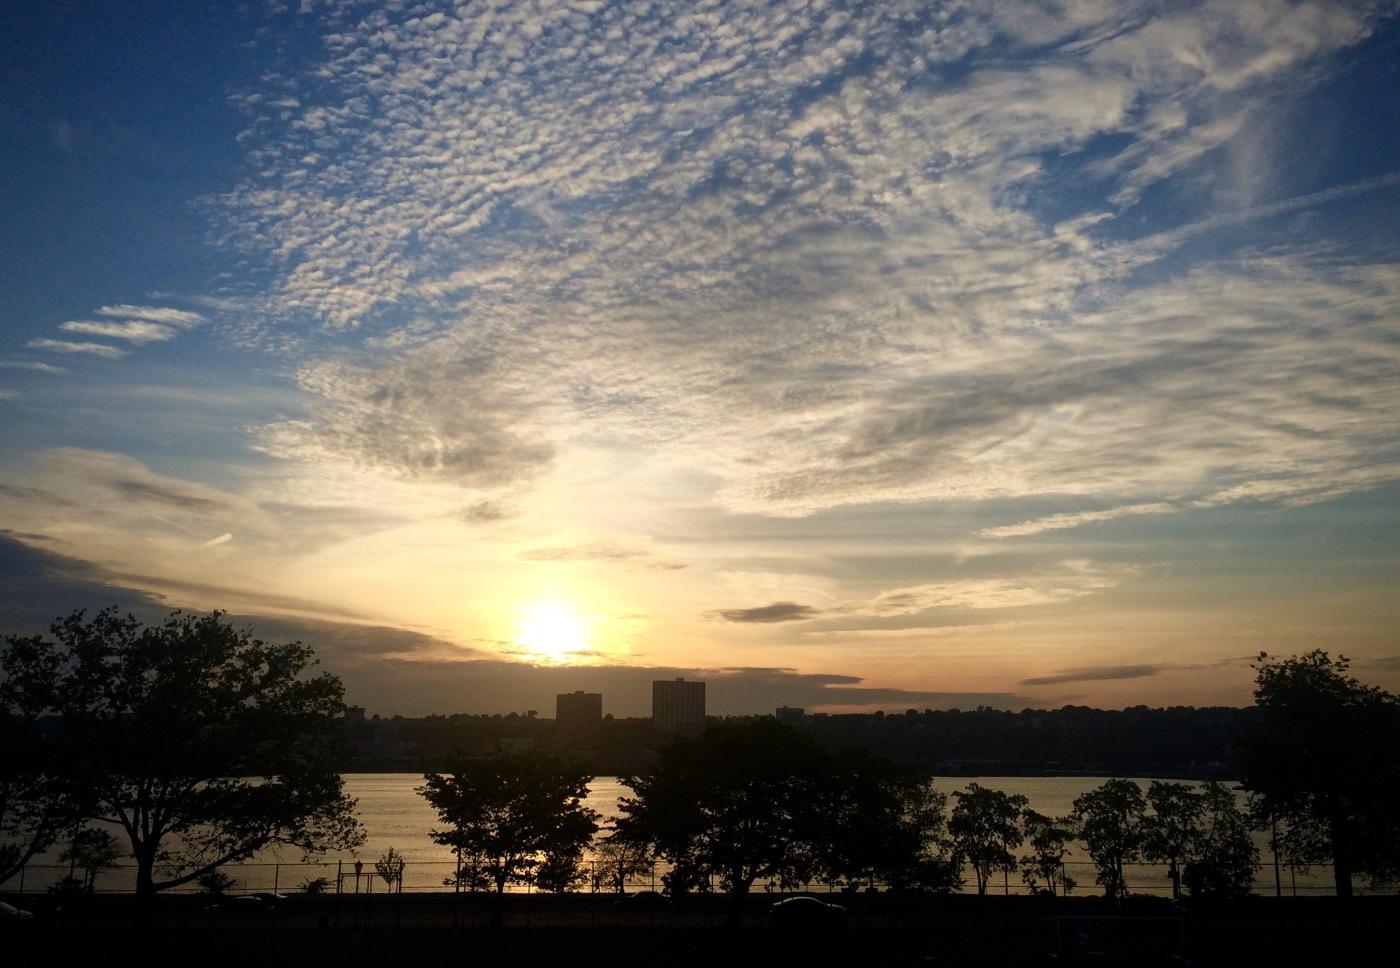 Day 144/4 riverside run at sunset